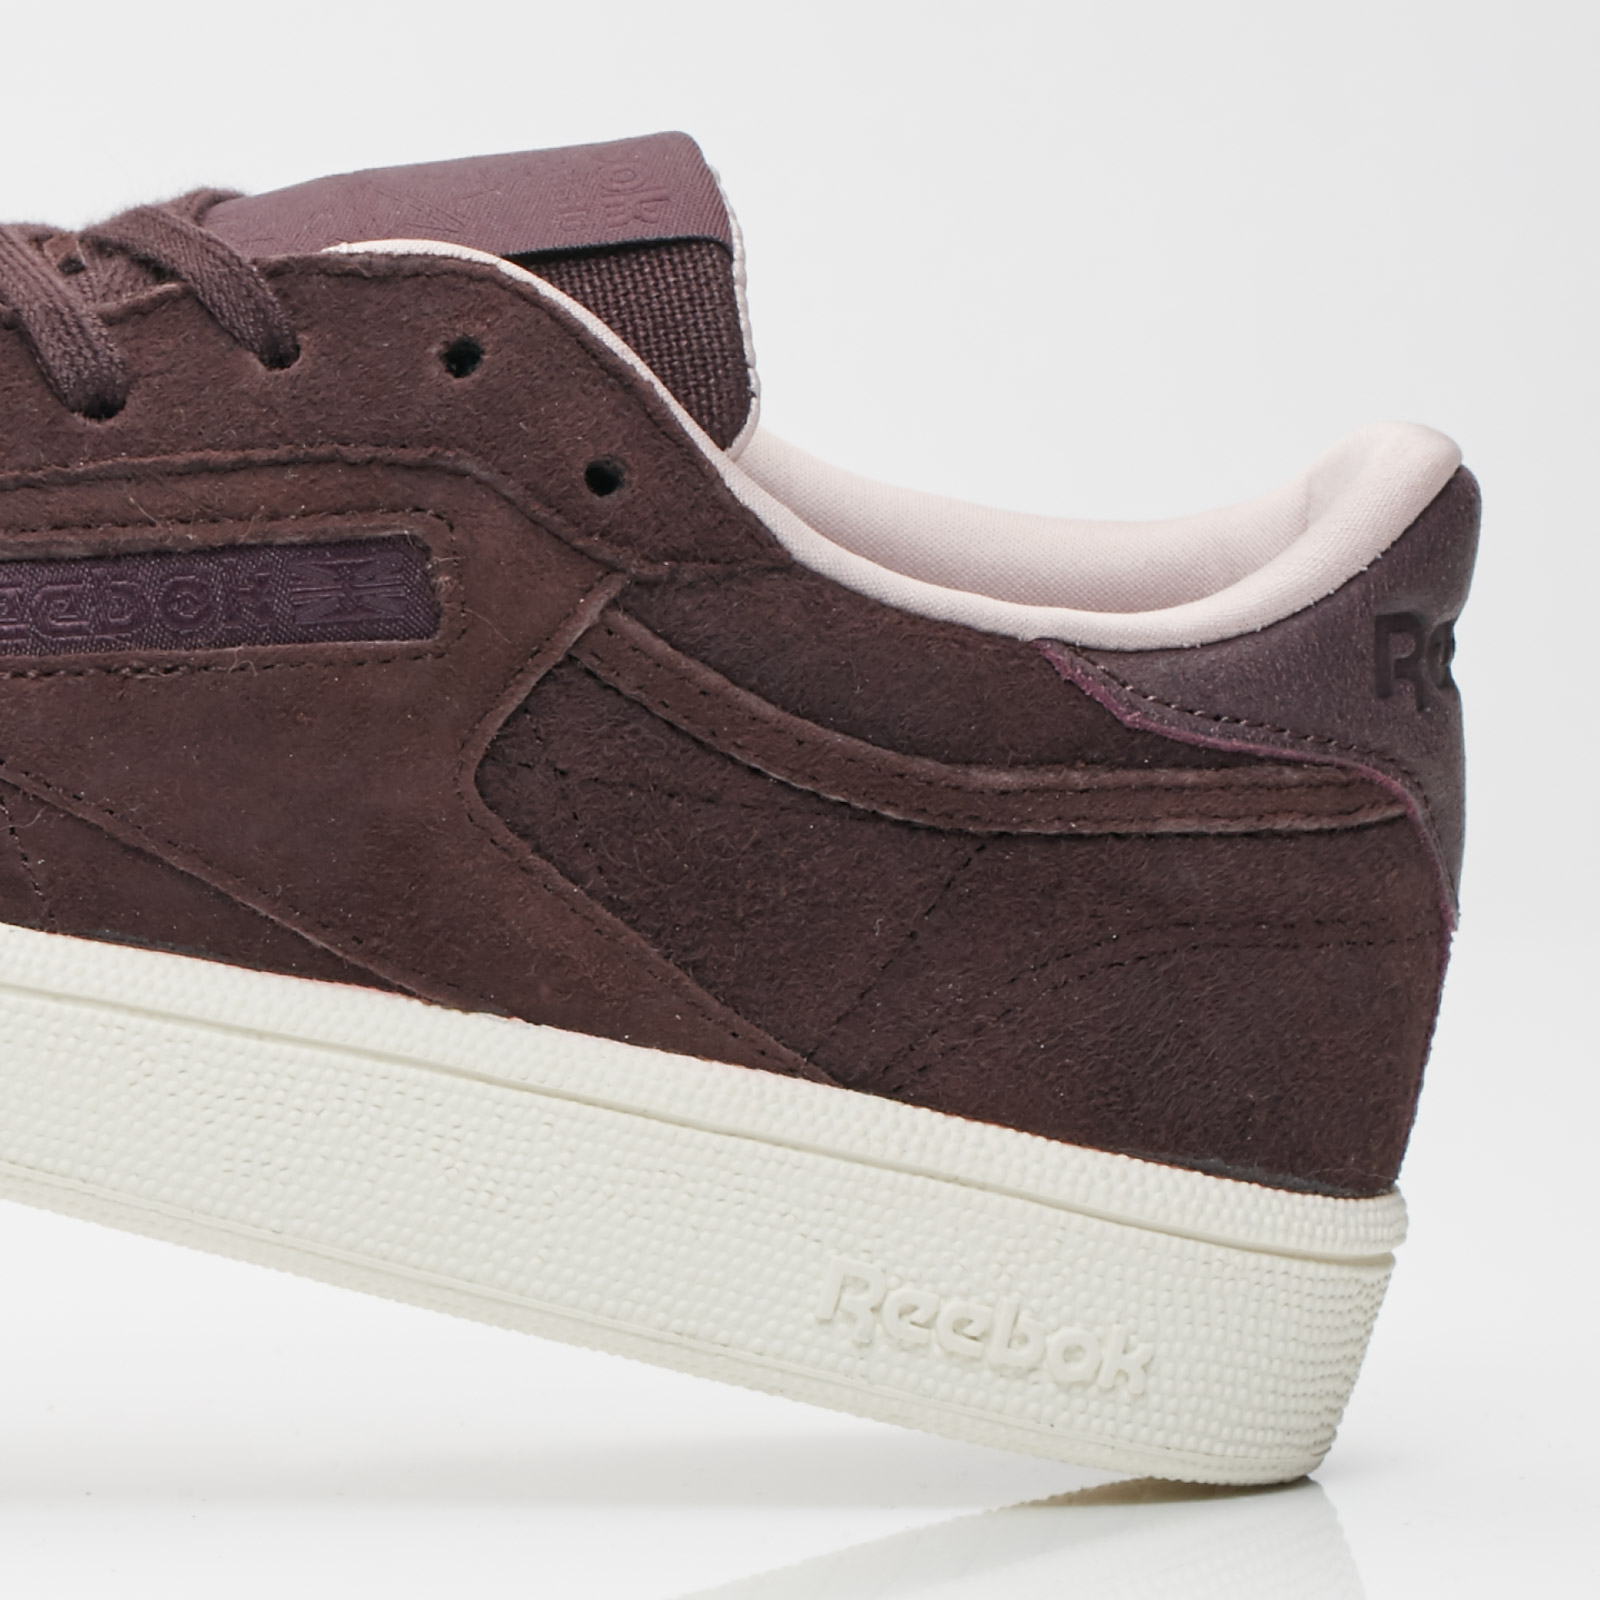 Reebok Club C 85 W&W Bs5192 Sneakersnstuff | sneakers